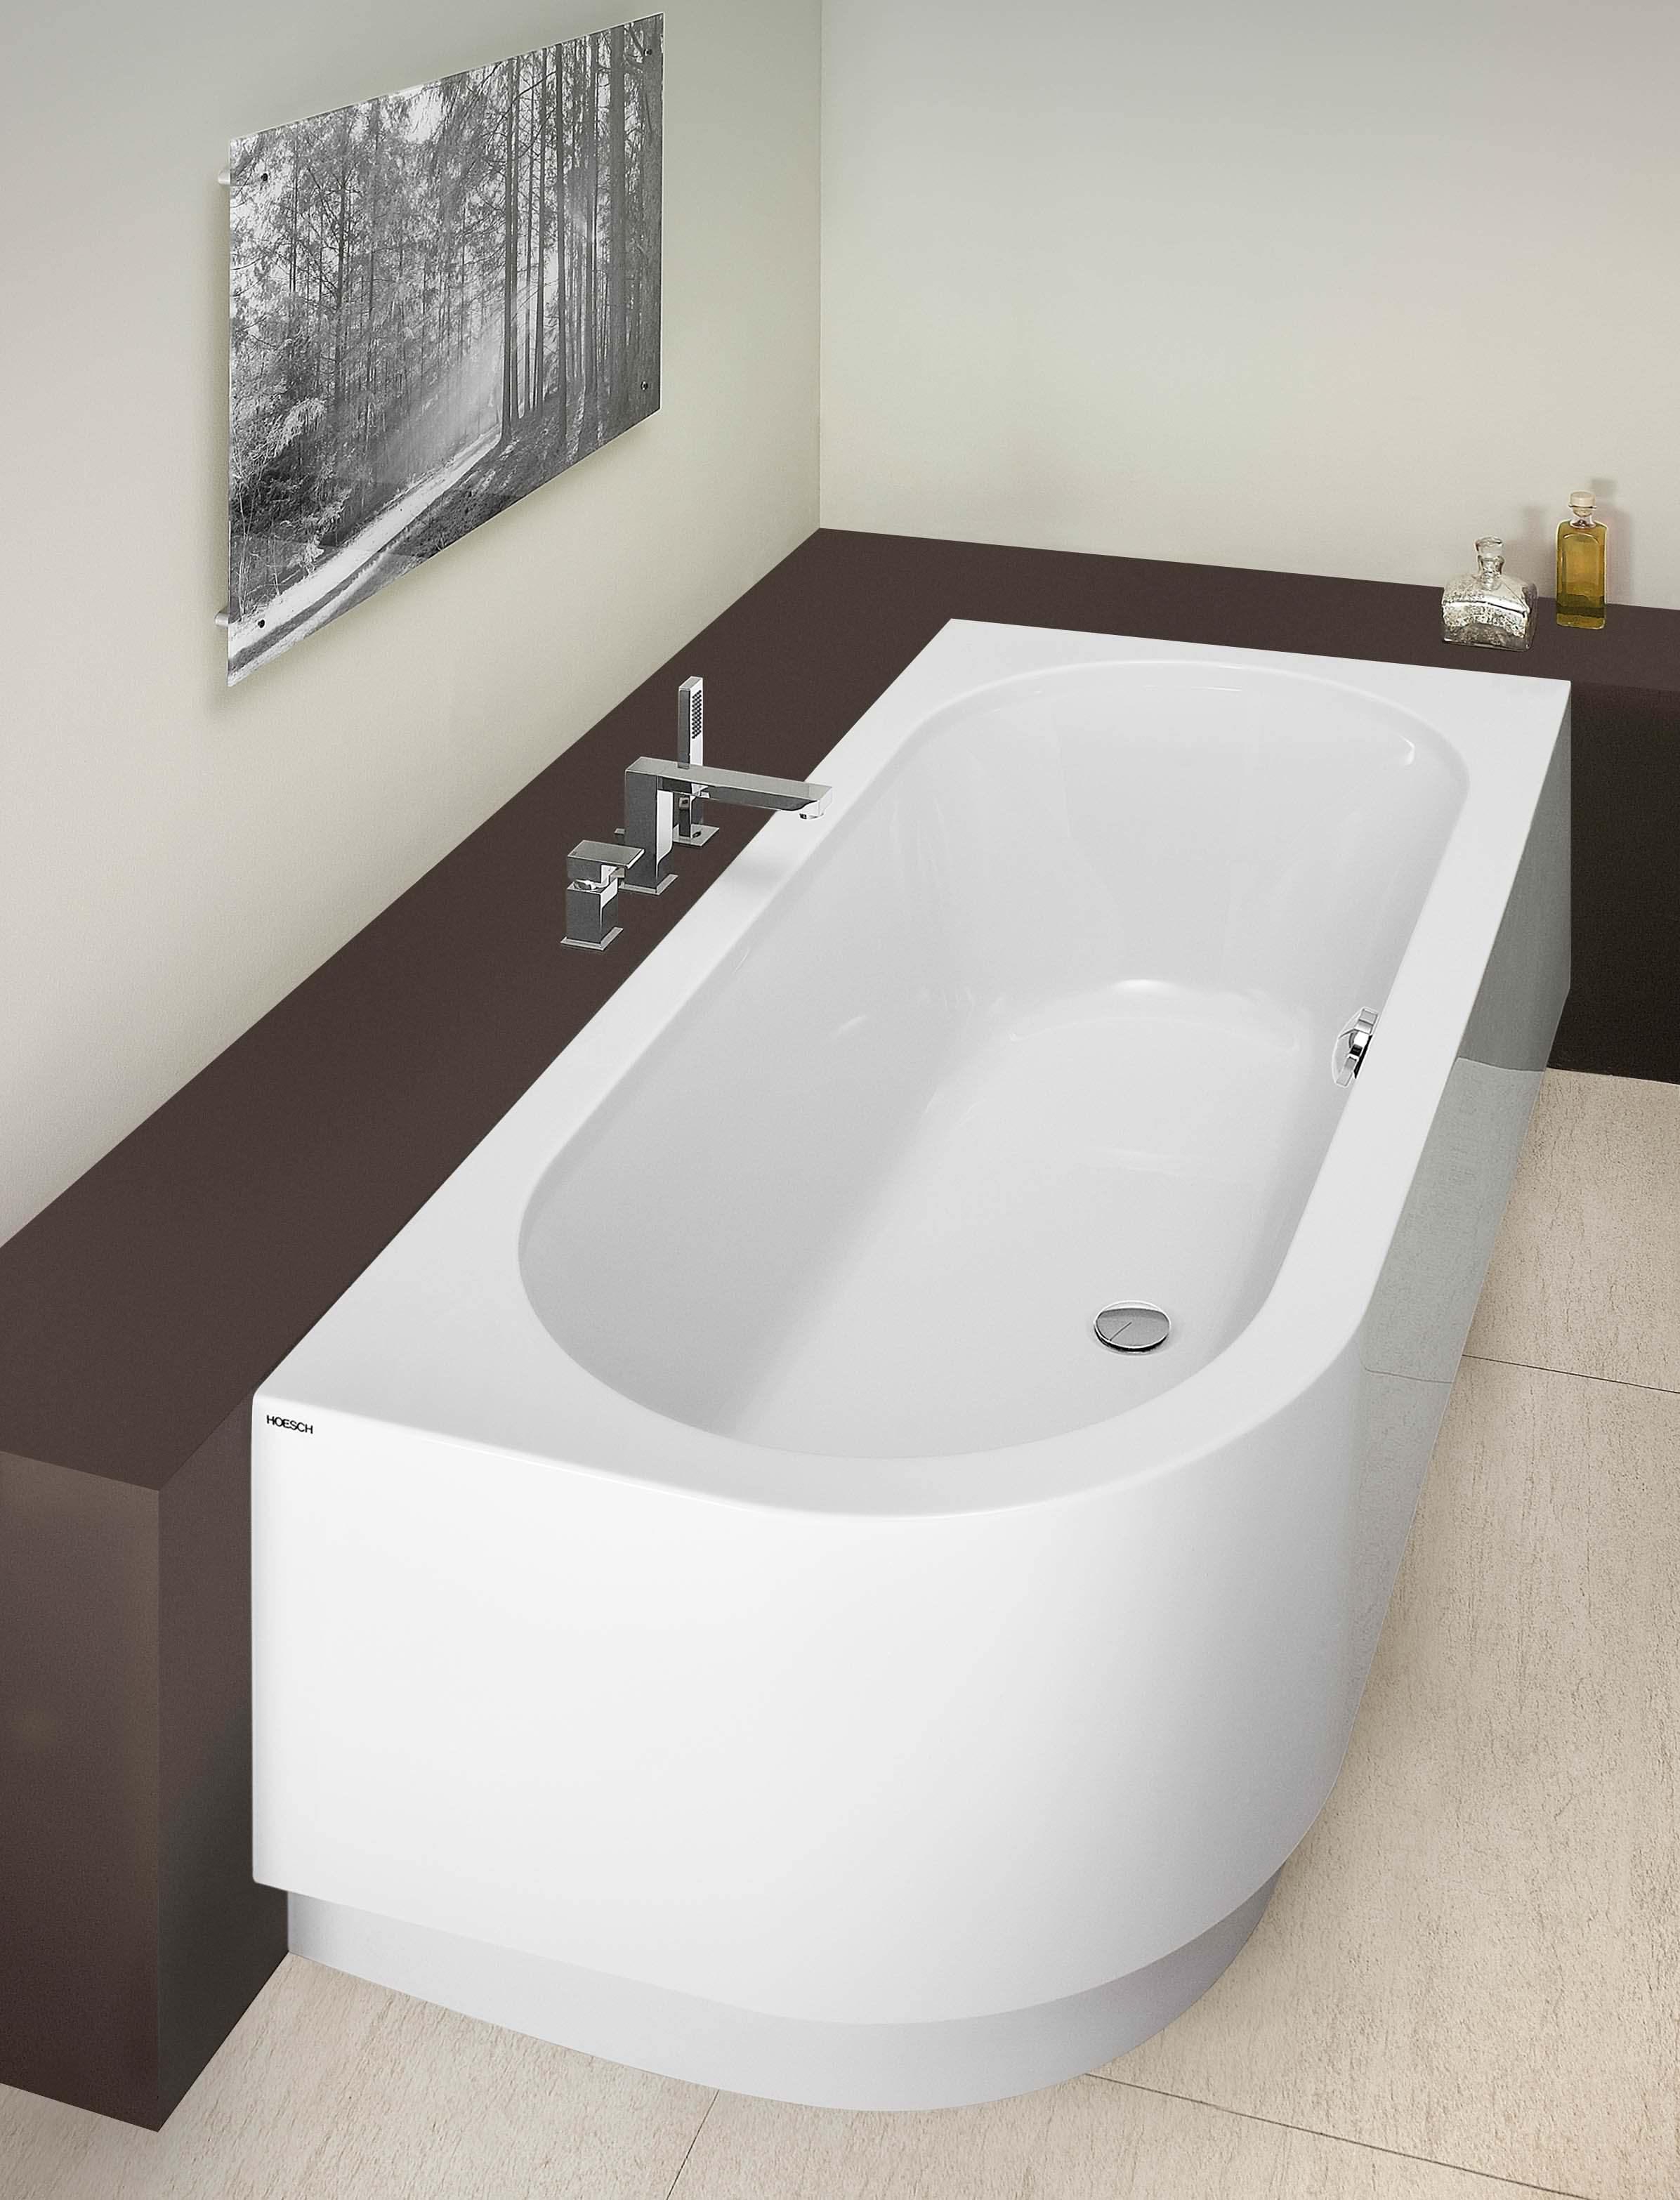 hoesch happy d eckbadewanne 1808 x 808 mm rechts mit. Black Bedroom Furniture Sets. Home Design Ideas